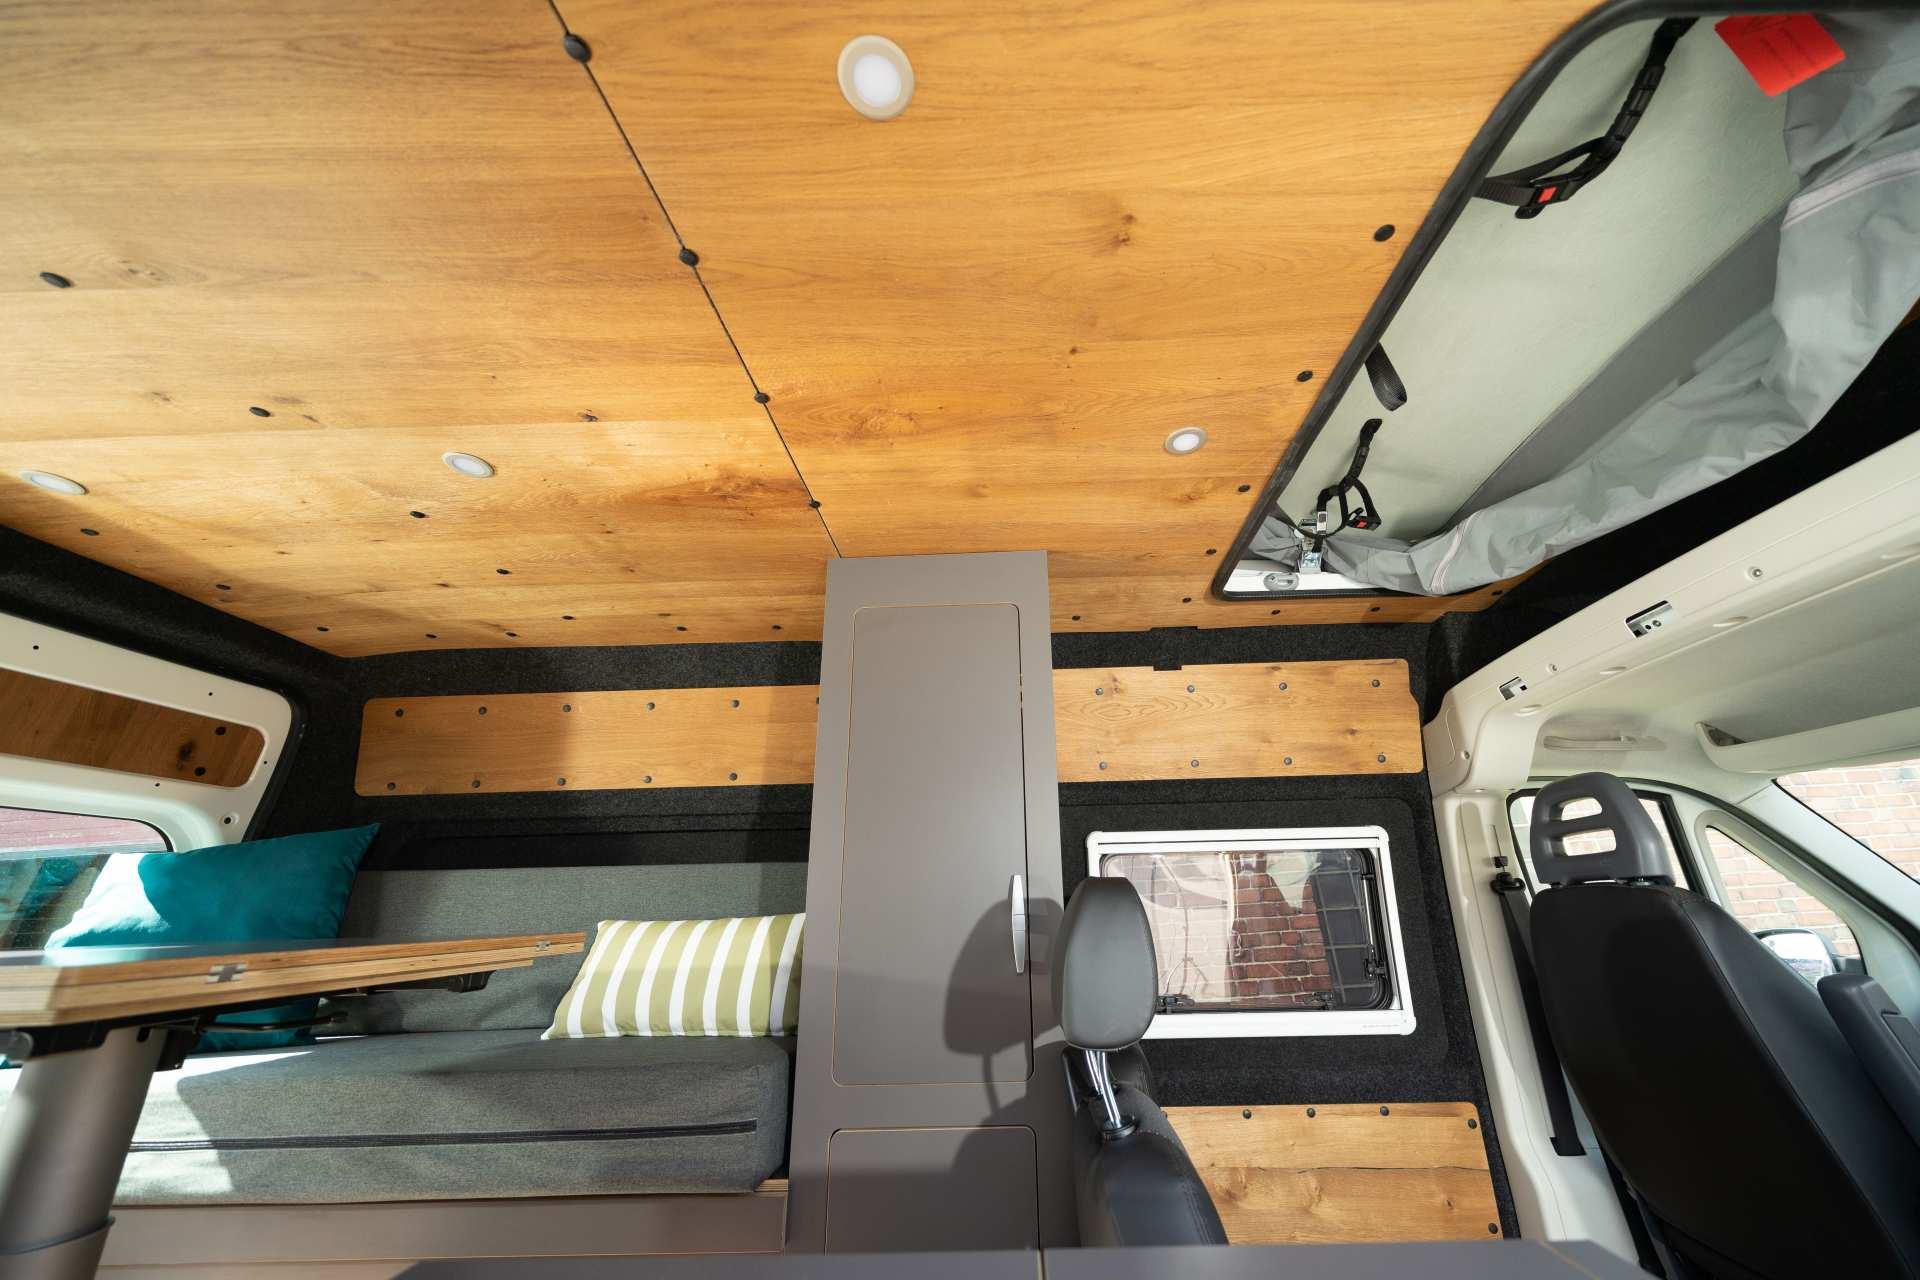 Individualausbau: Zwei-Raumwohnung Peugeot Boxer L2 H2 - 16